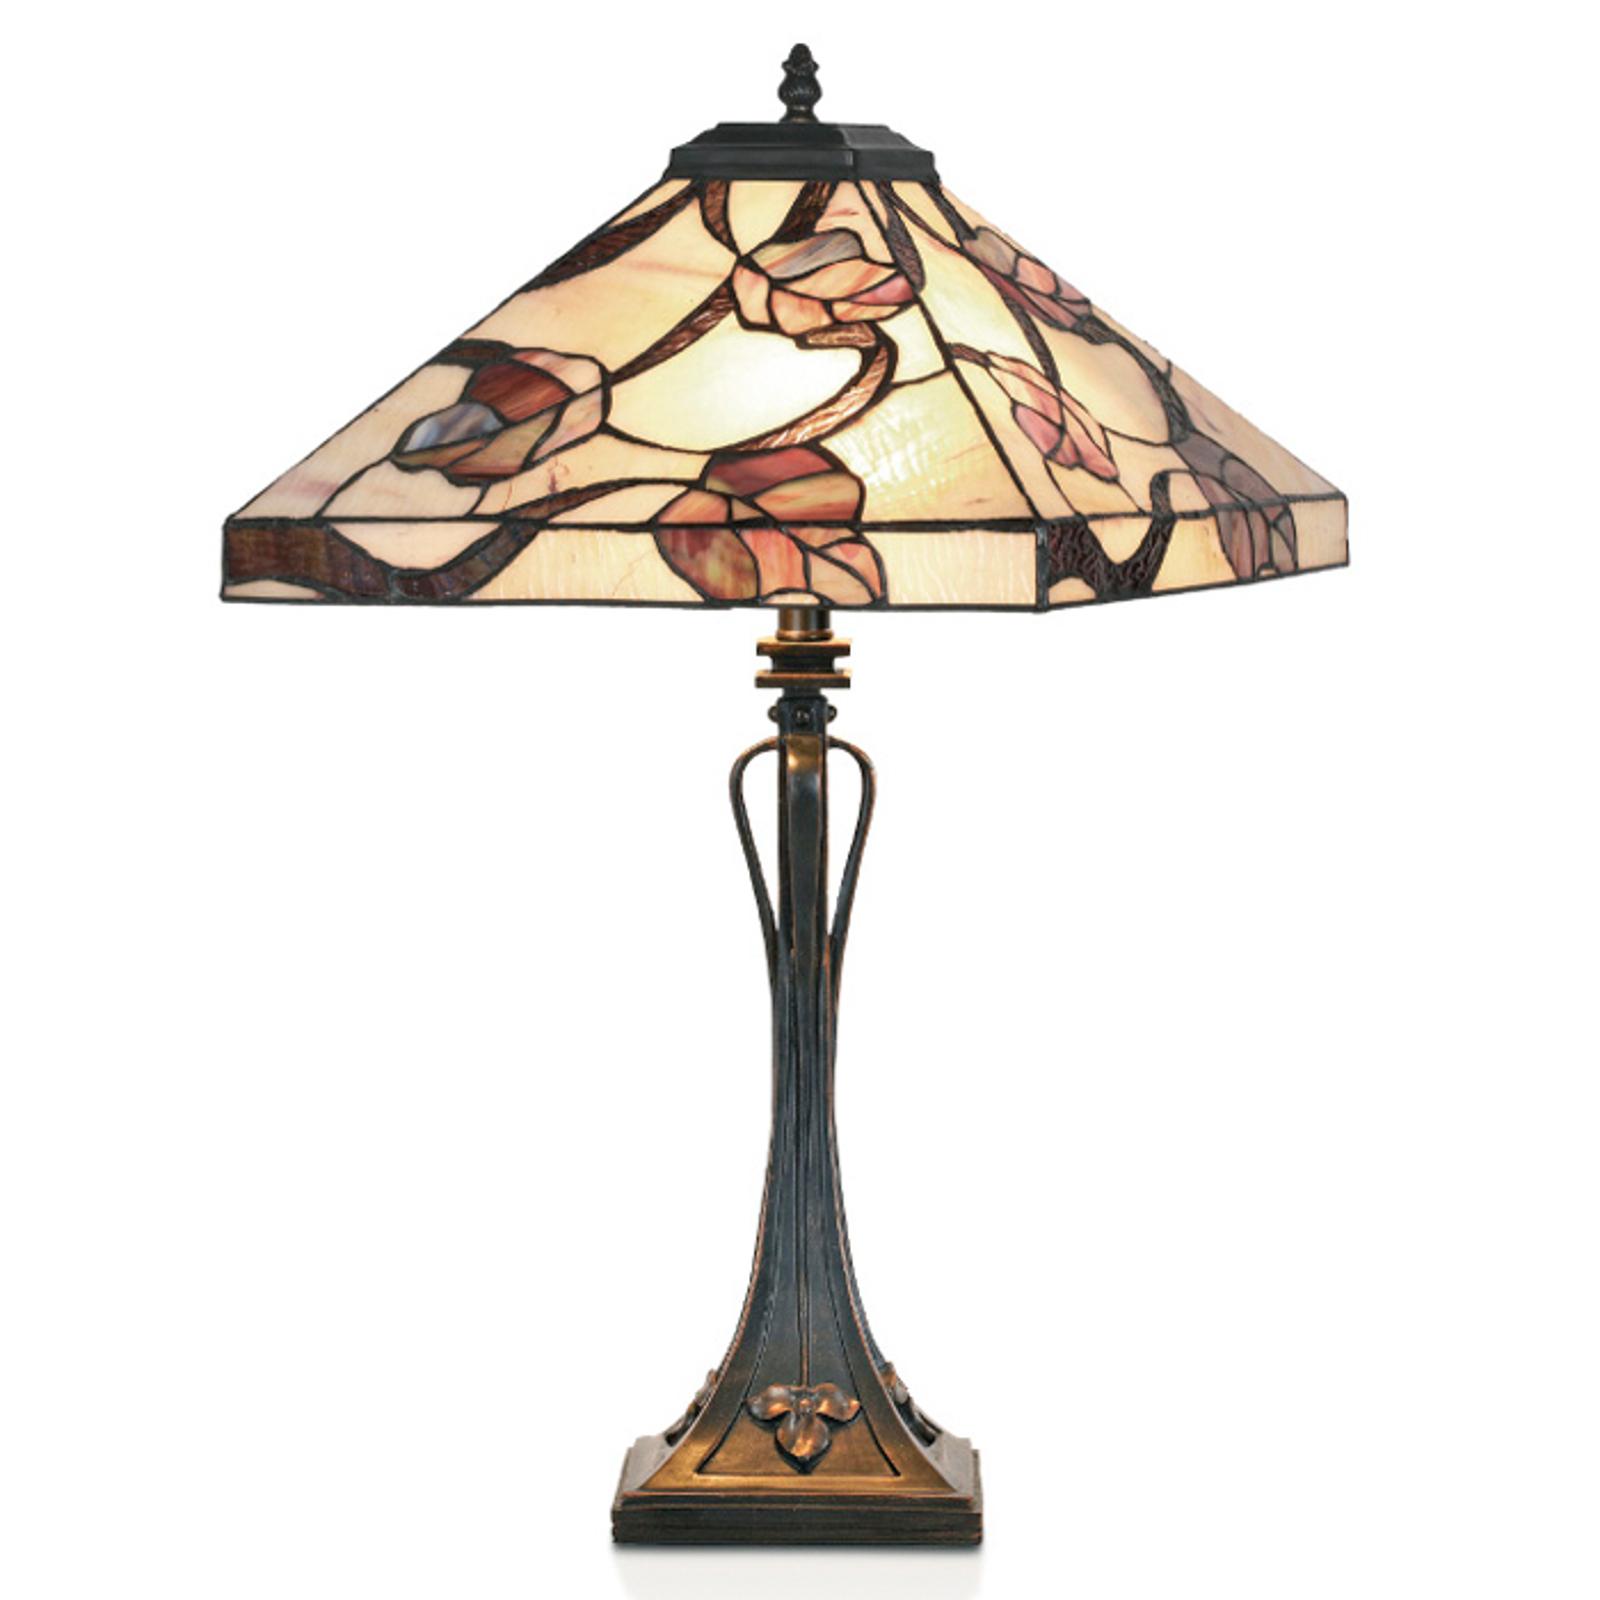 APPOLONIA bordlampe i Tiffany stil